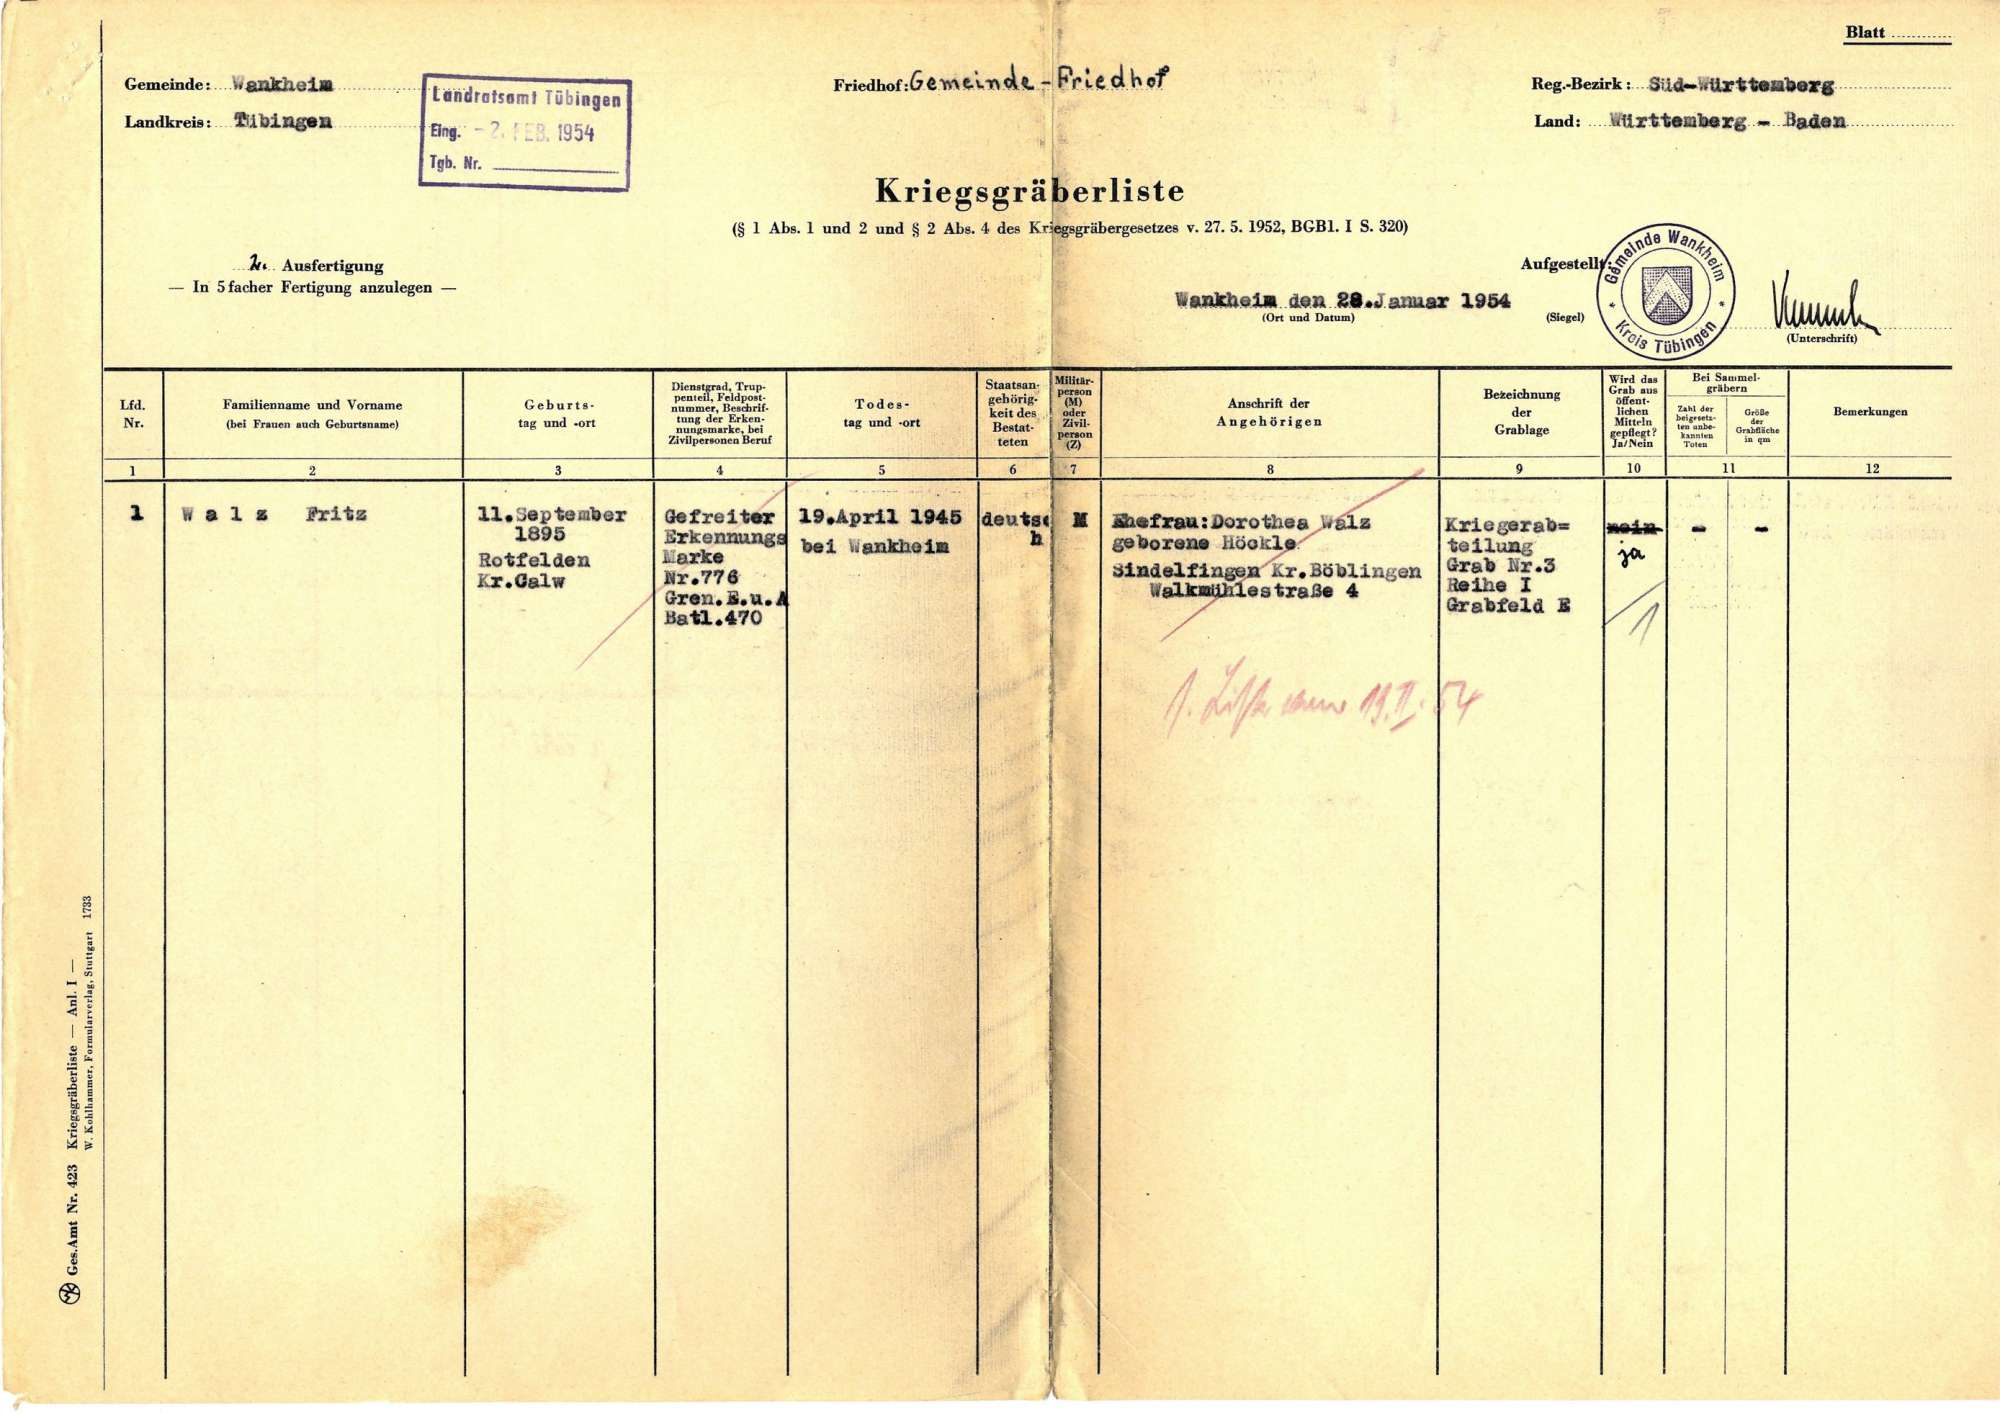 Wankheim, Bild 2